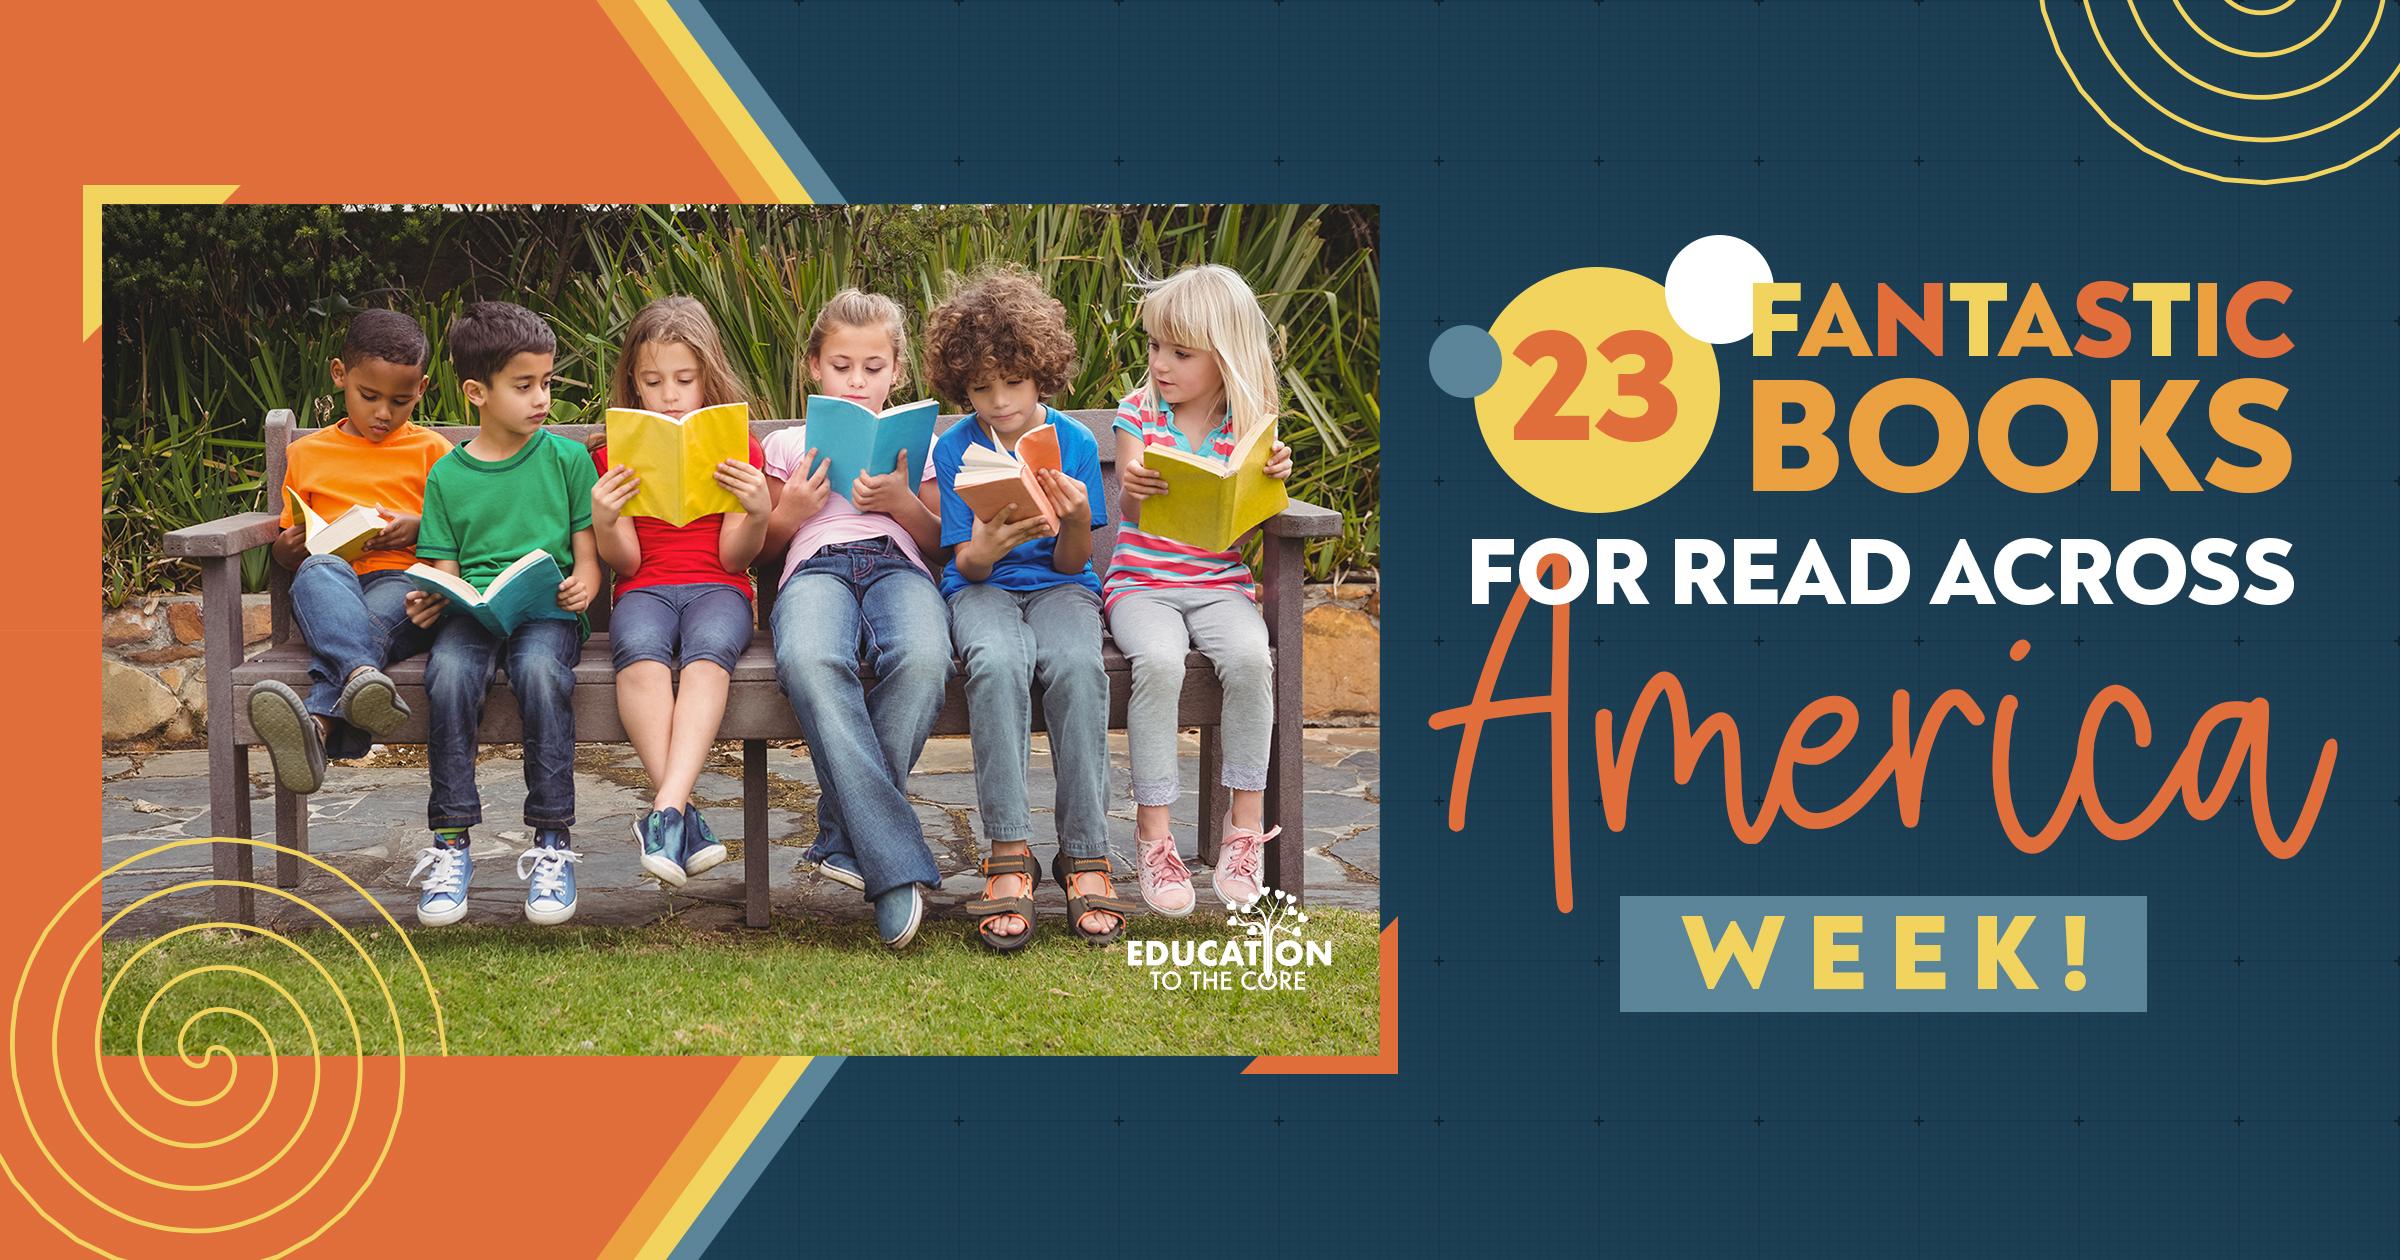 23 Fantastic Books for Read Across America Week!